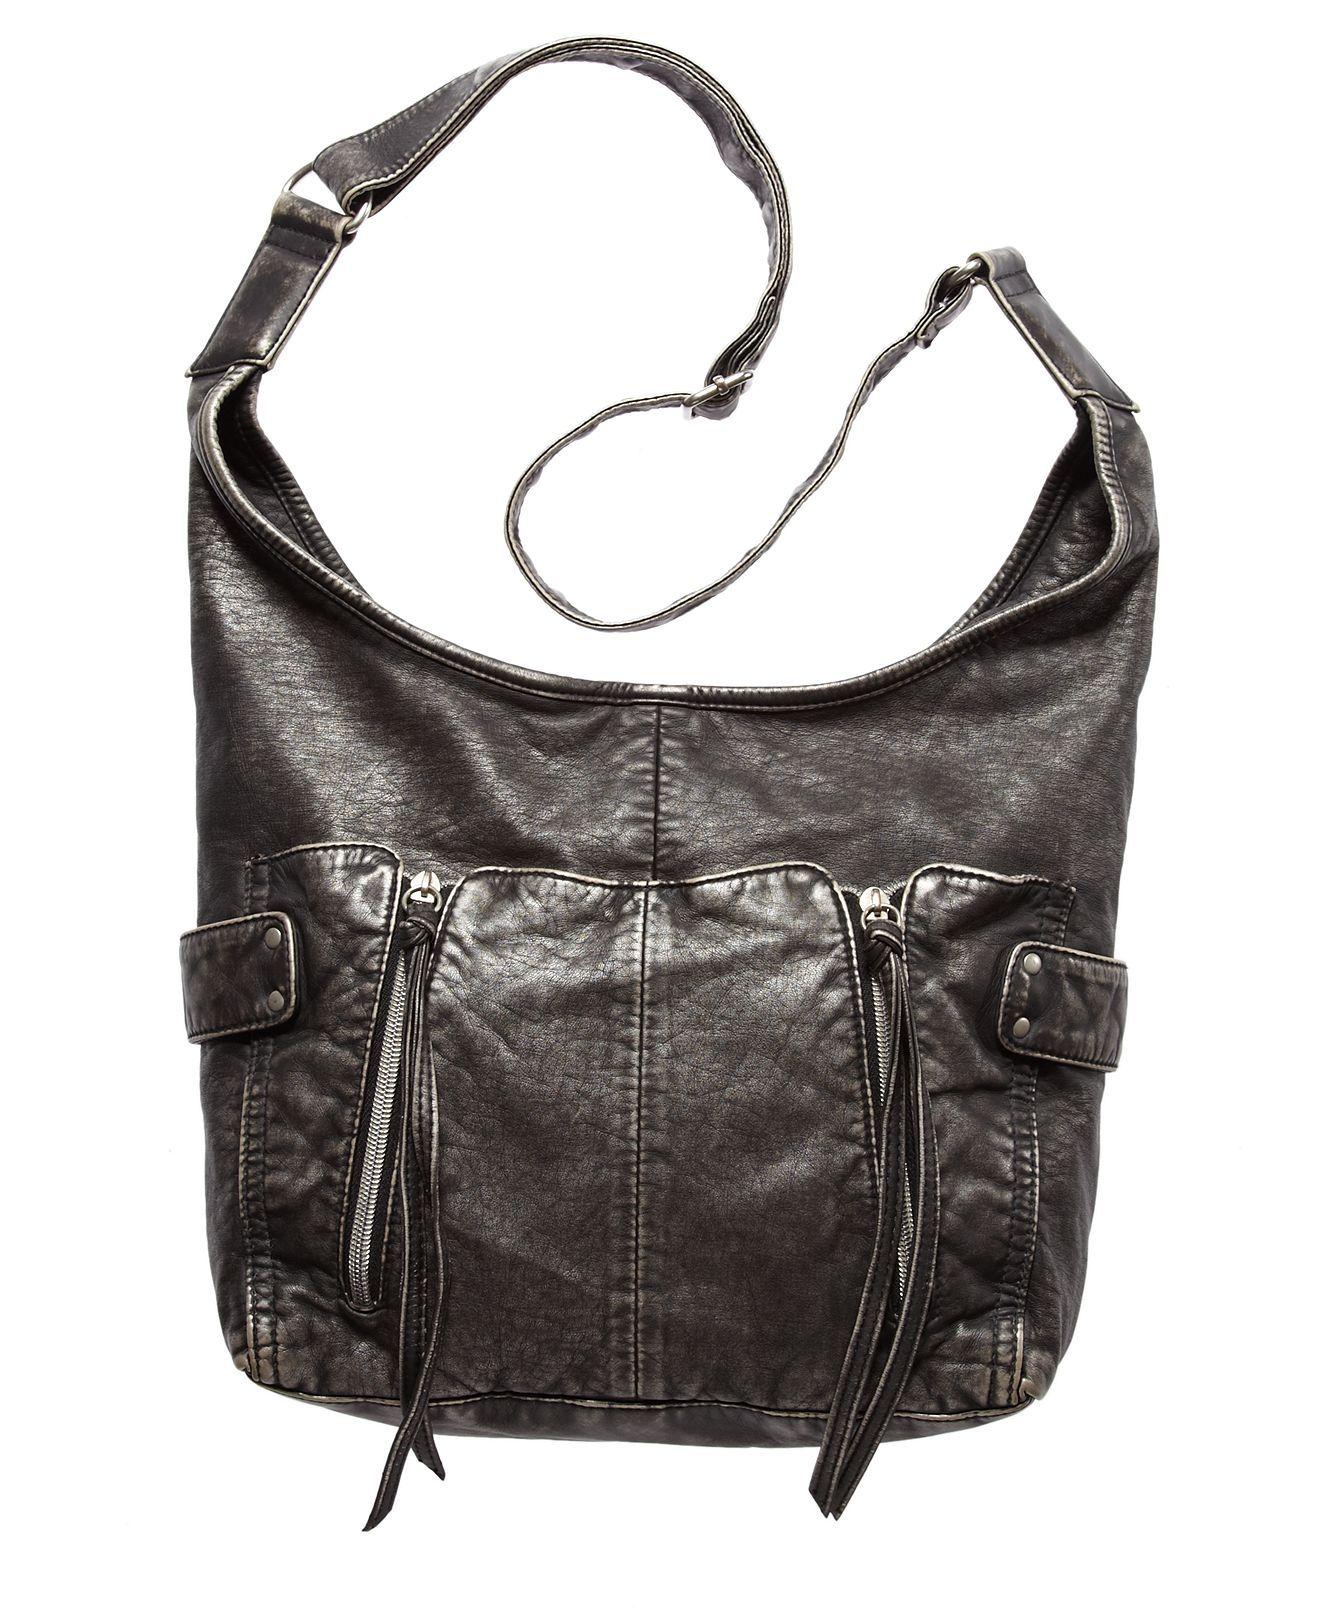 American Rag Handbag Sunny Crossbody Hobo Bag Handbags Accessories Macy S But In The Gray